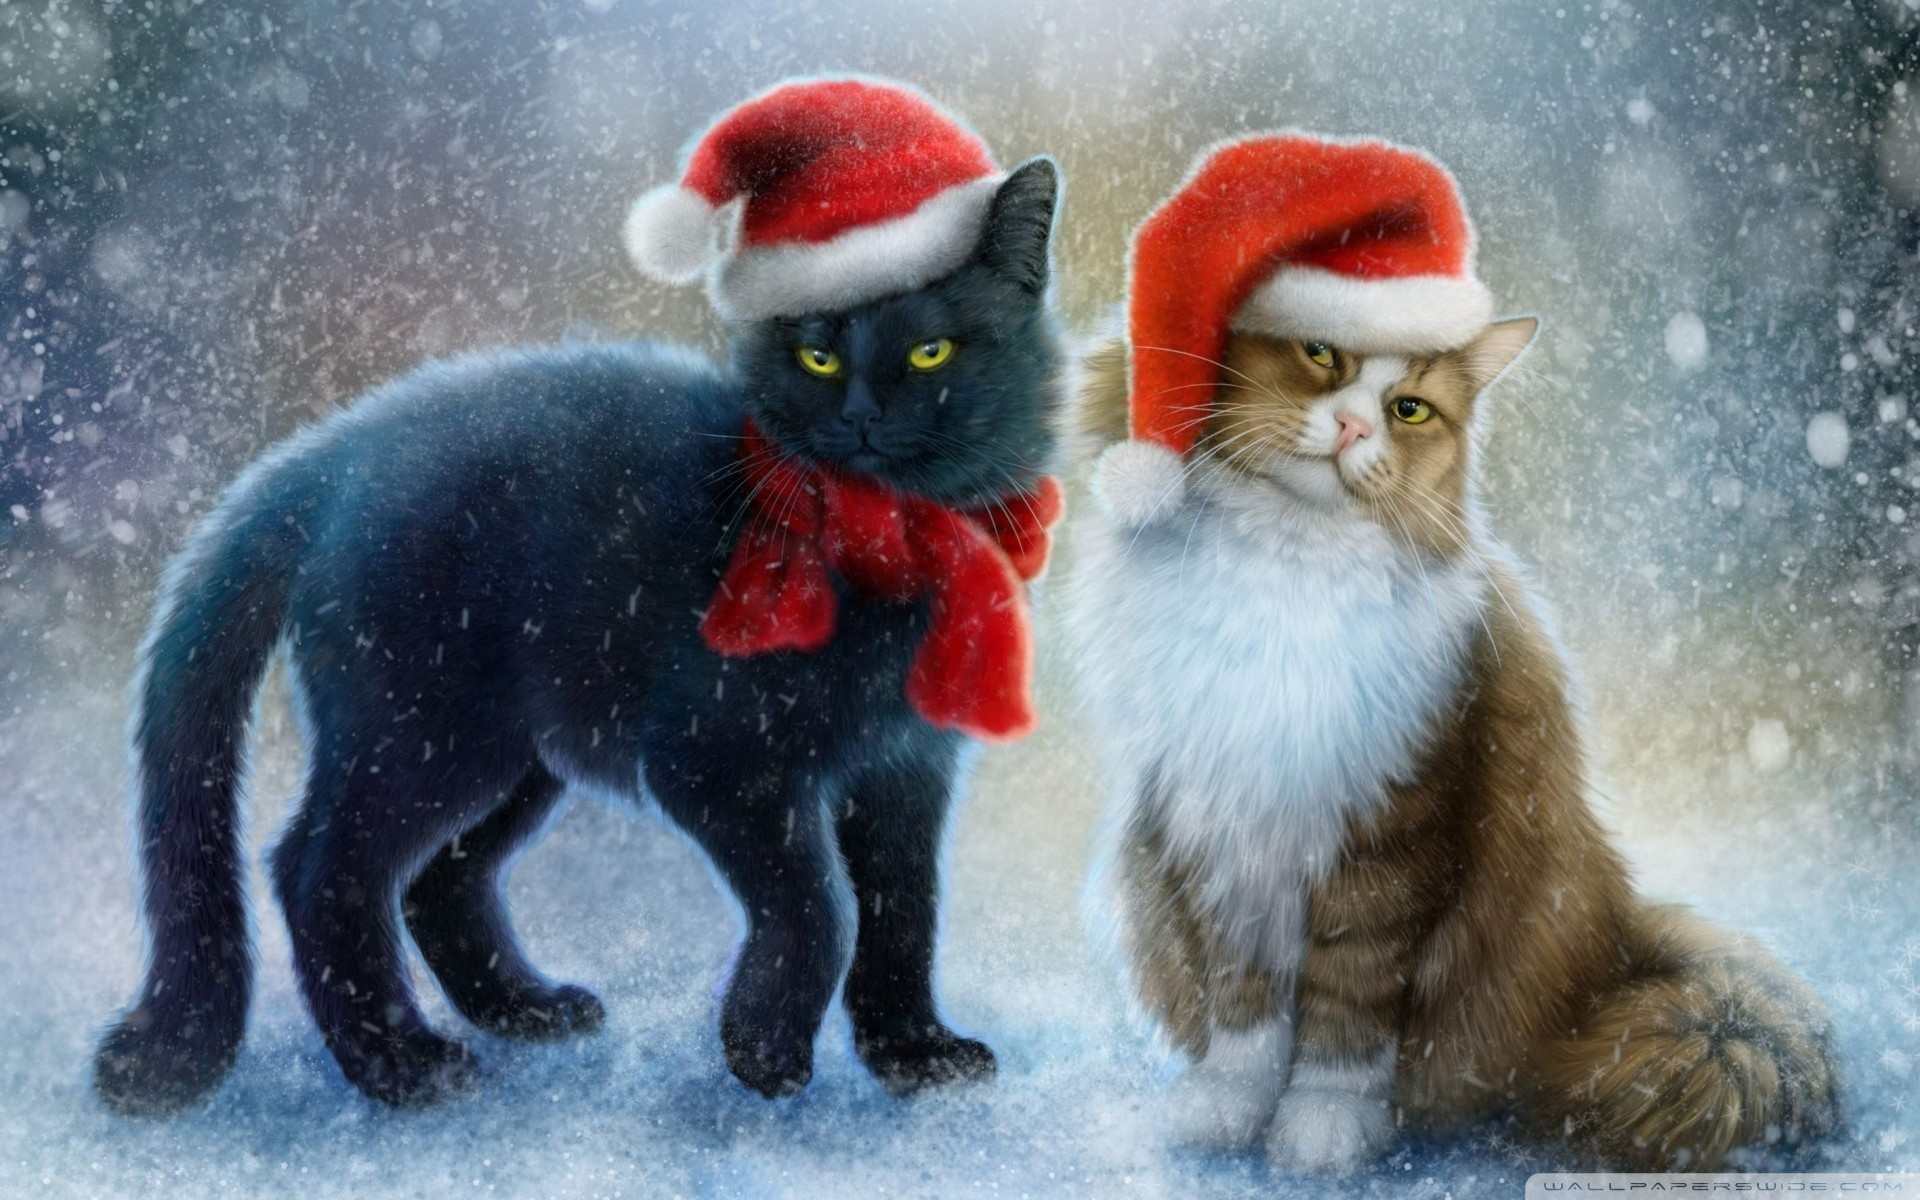 Black Cat Christmas Wallpaper (55+ images)